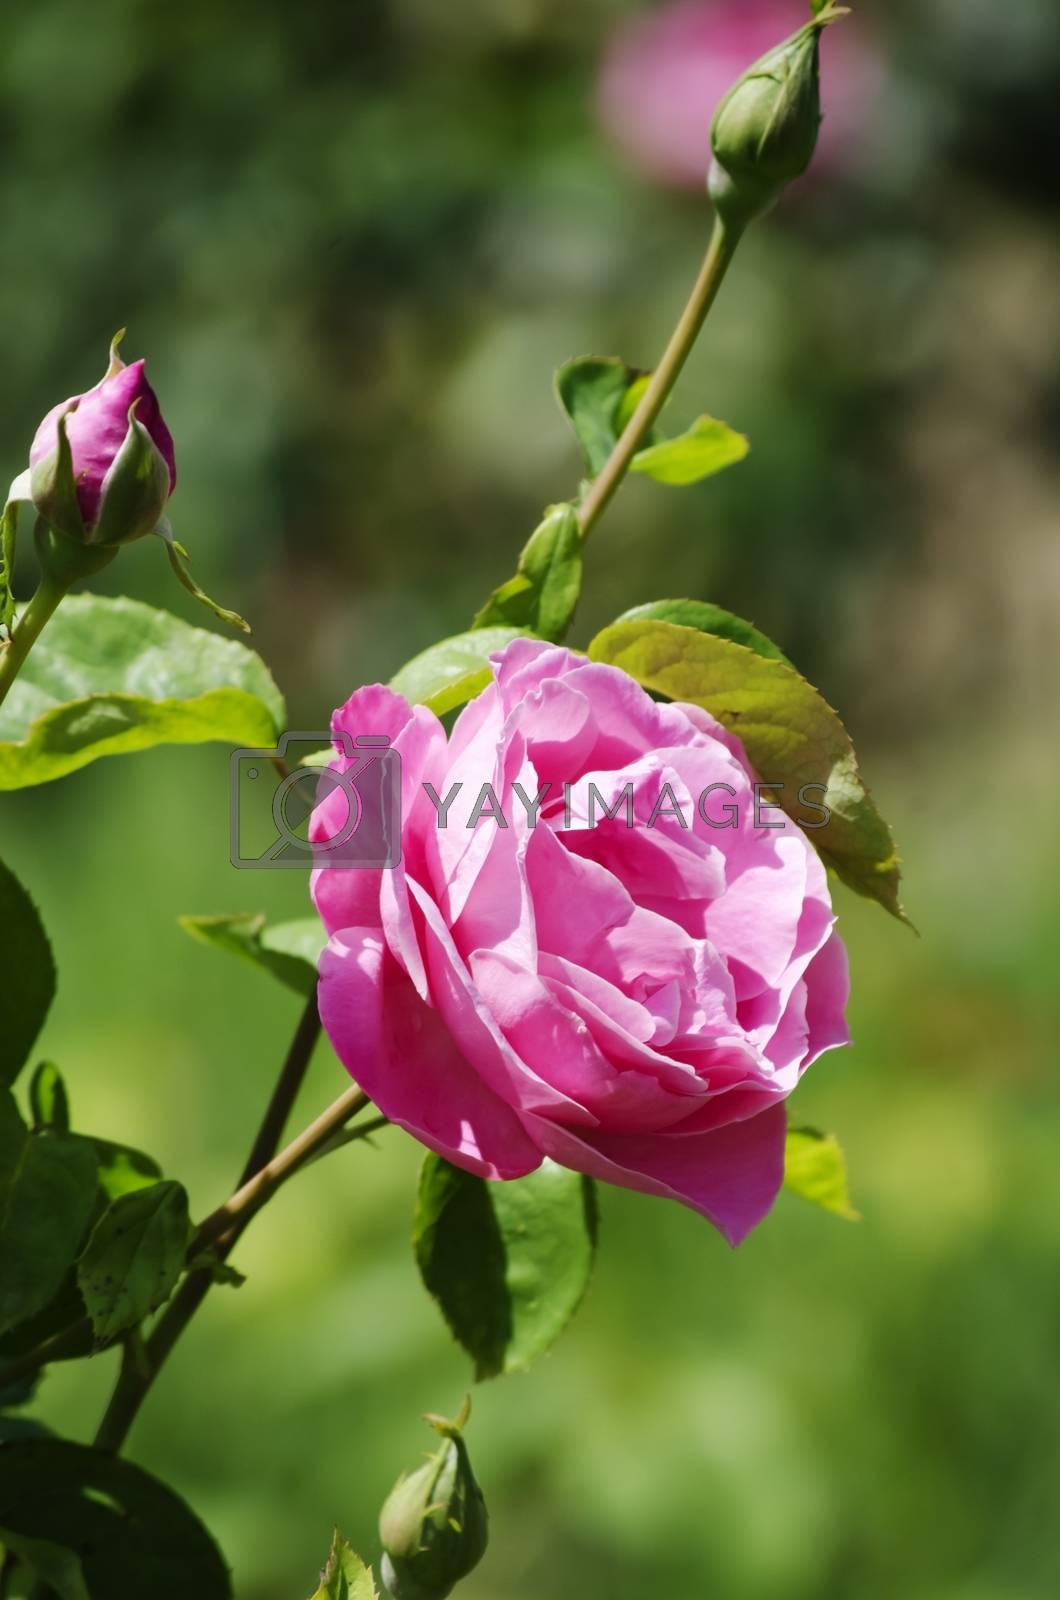 Single Rose Flower Over Natural Green Background